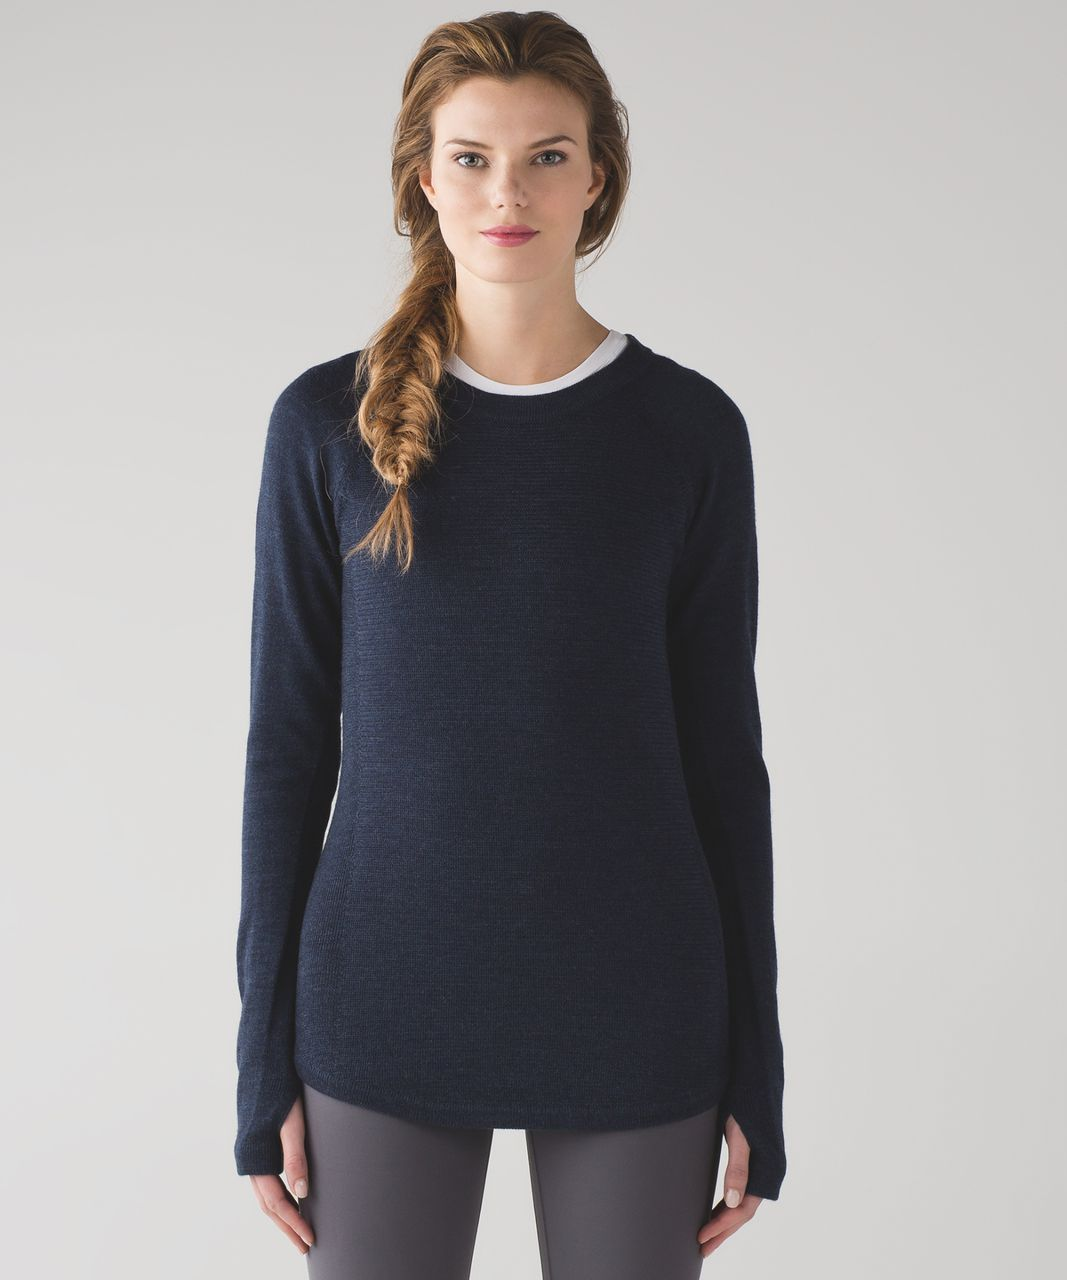 1c4695812e Lululemon Sit In Lotus Sweater - Heathered Inkwell | My lululemon ...